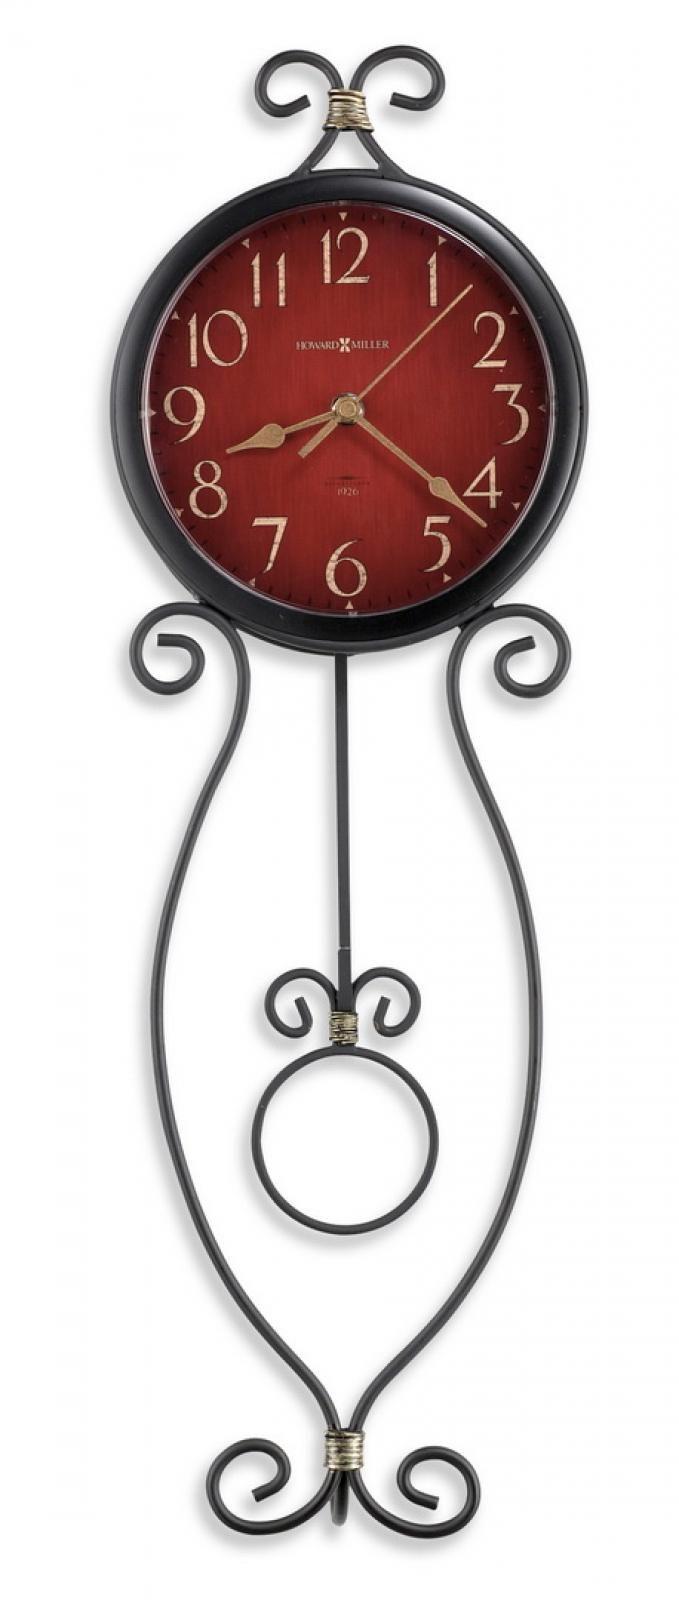 25 melhores ideias de howard miller wall clock no pinterest howard miller wall clock 625f392 amipublicfo Gallery